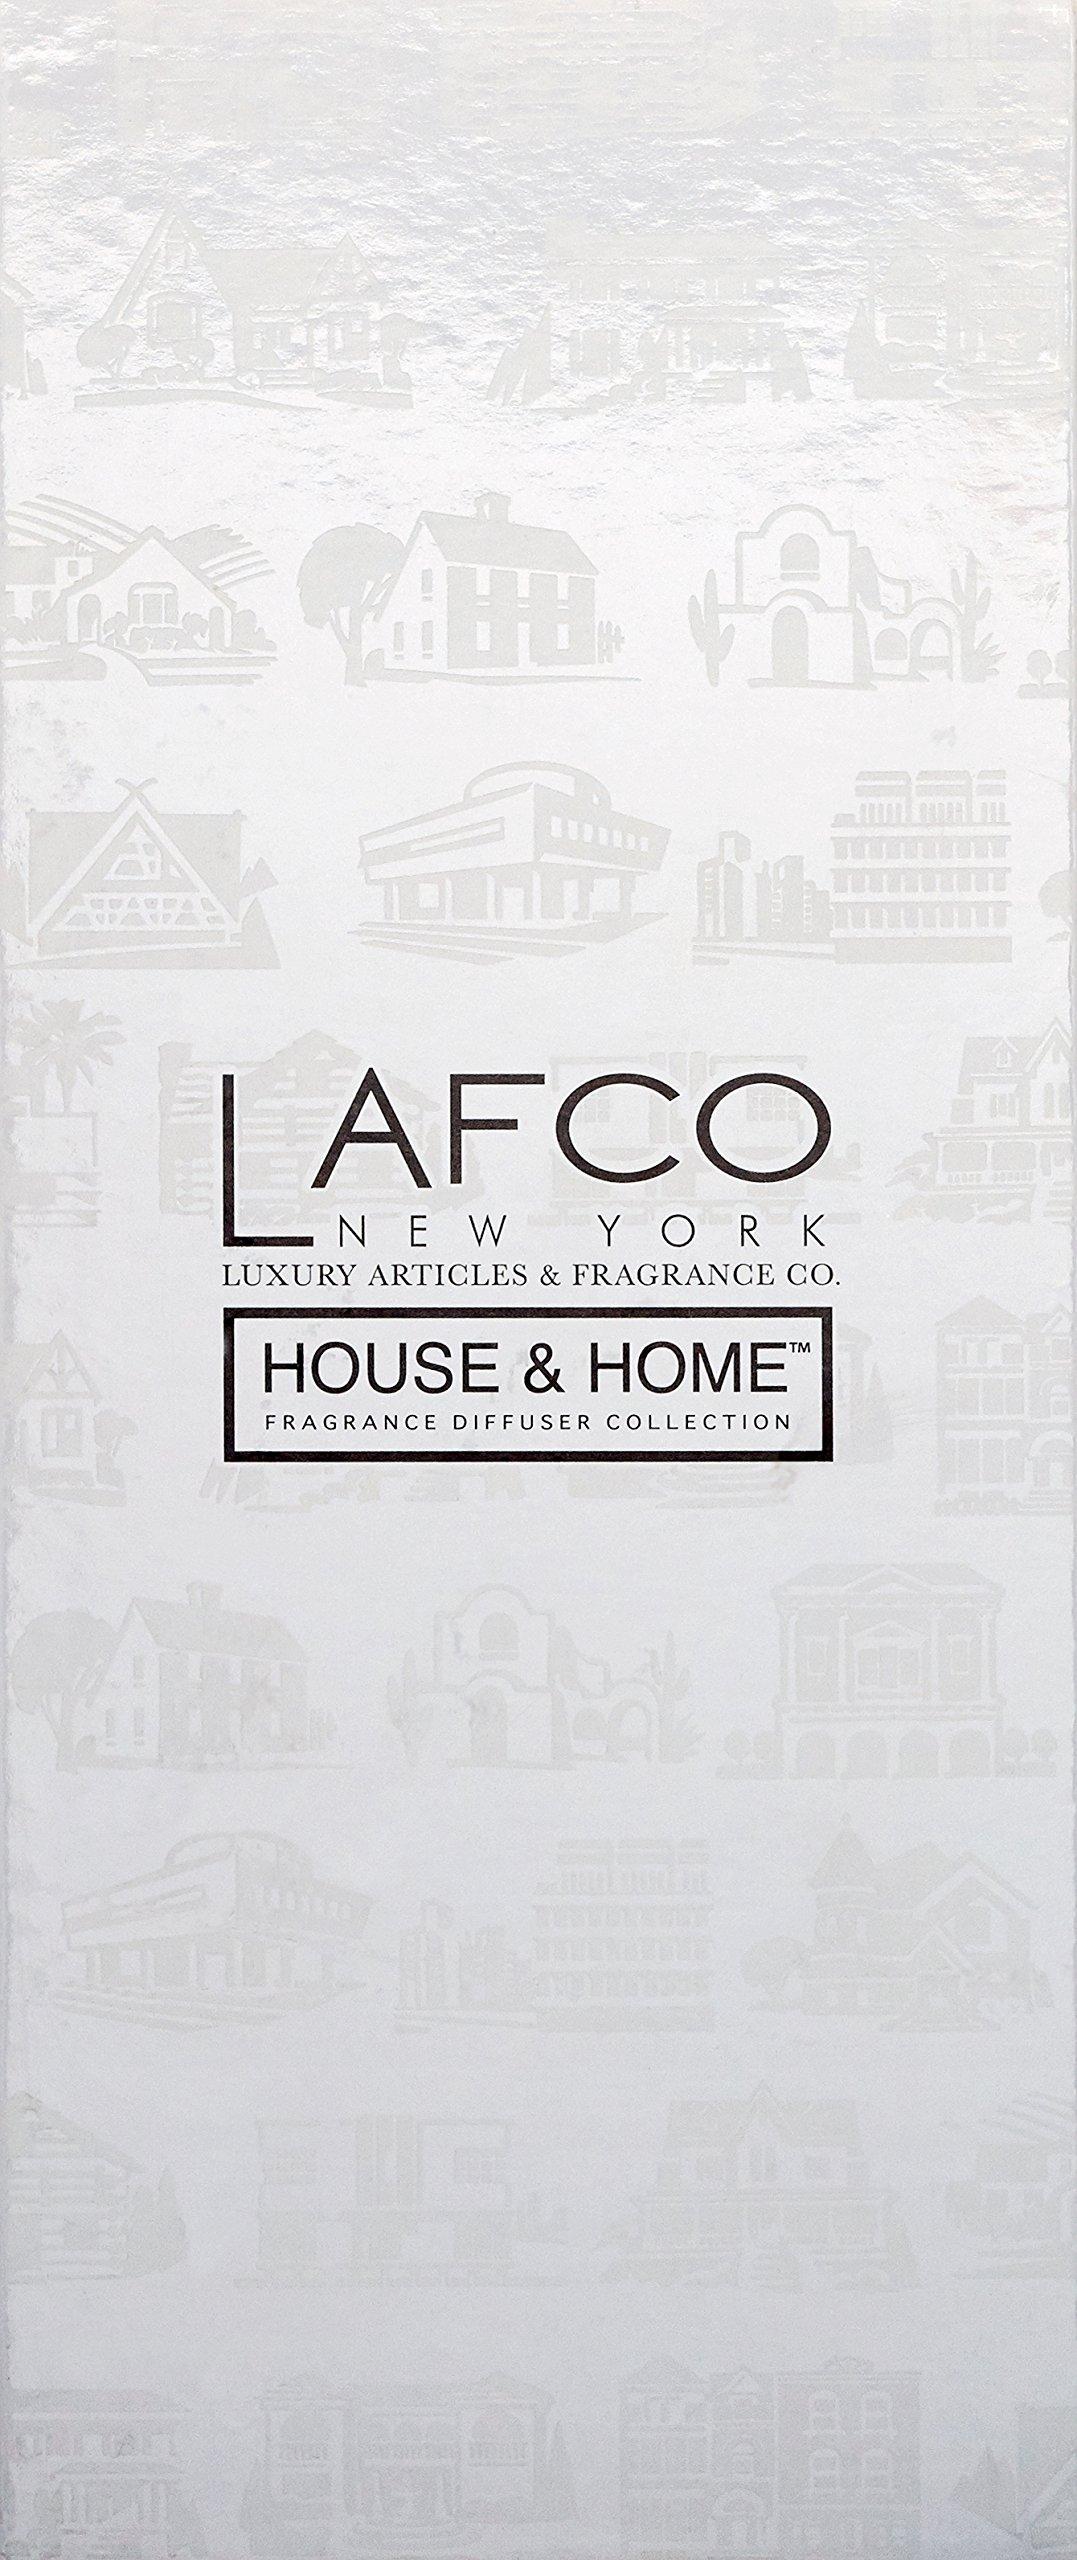 LAFCO House & Home Diffuser, Bedroom Chamomile Lavender, 15 Fl Oz by LAFCO (Image #4)